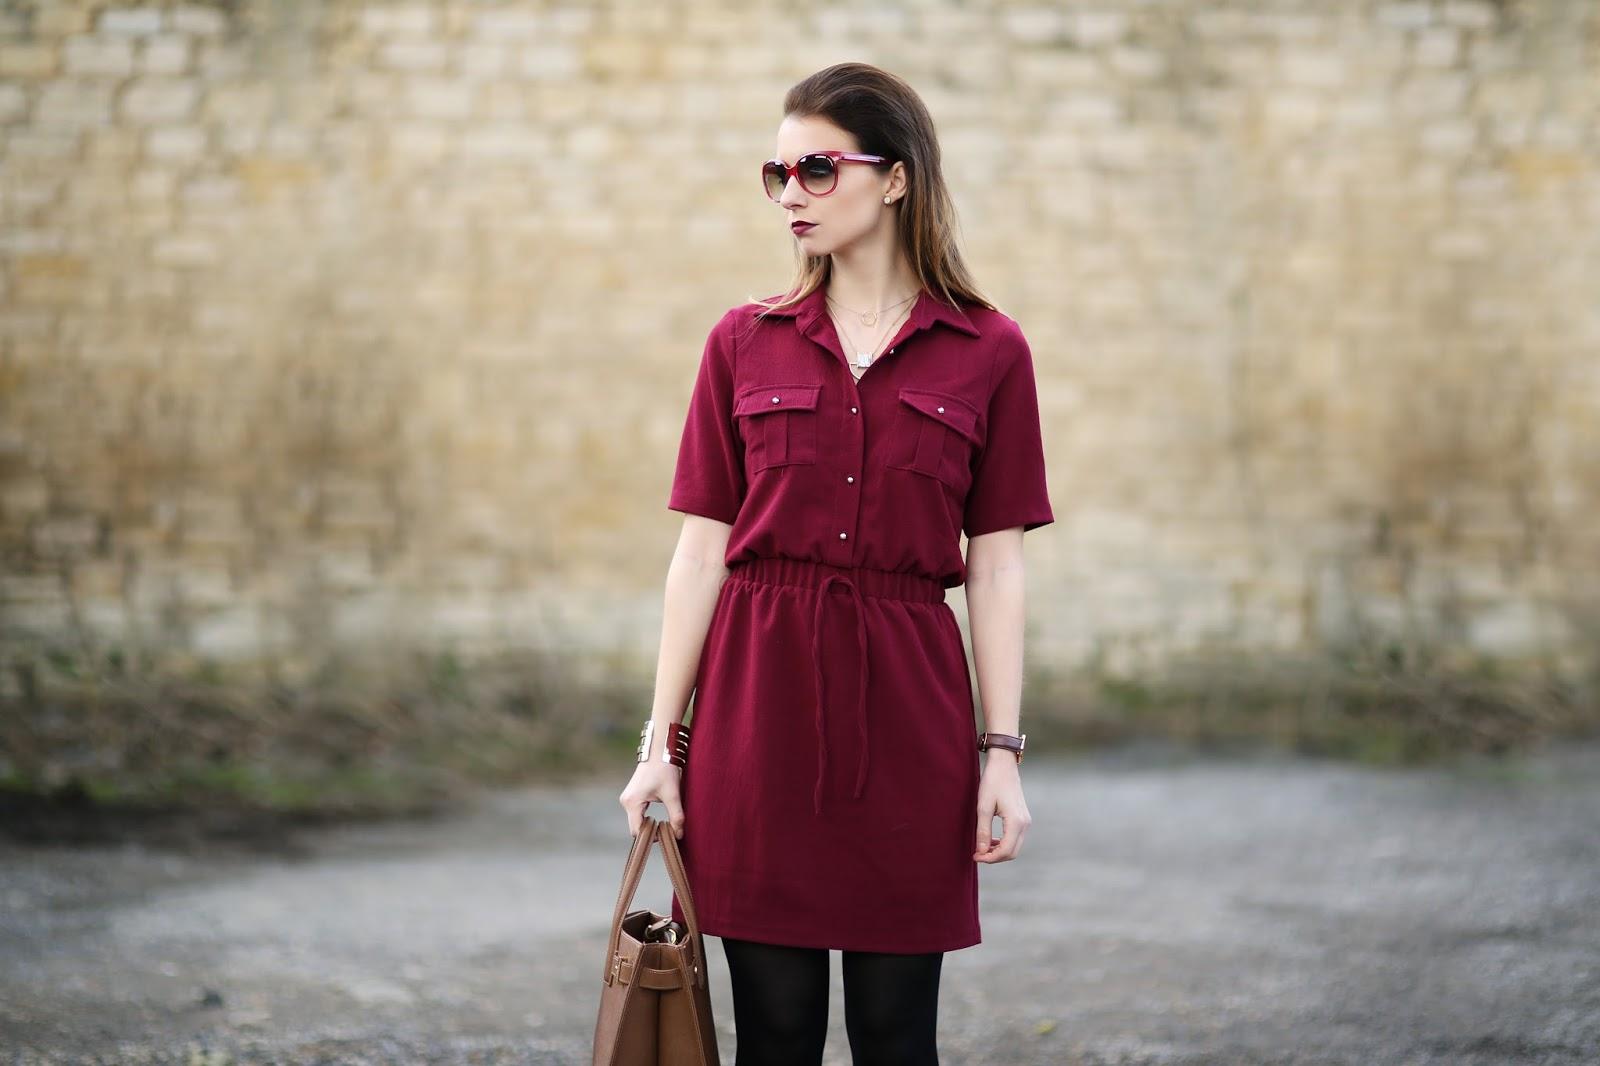 43224a95425b Boohoo Daisy Tie Waist Shirt Skater Dress| London Fashion Week | Eltoria